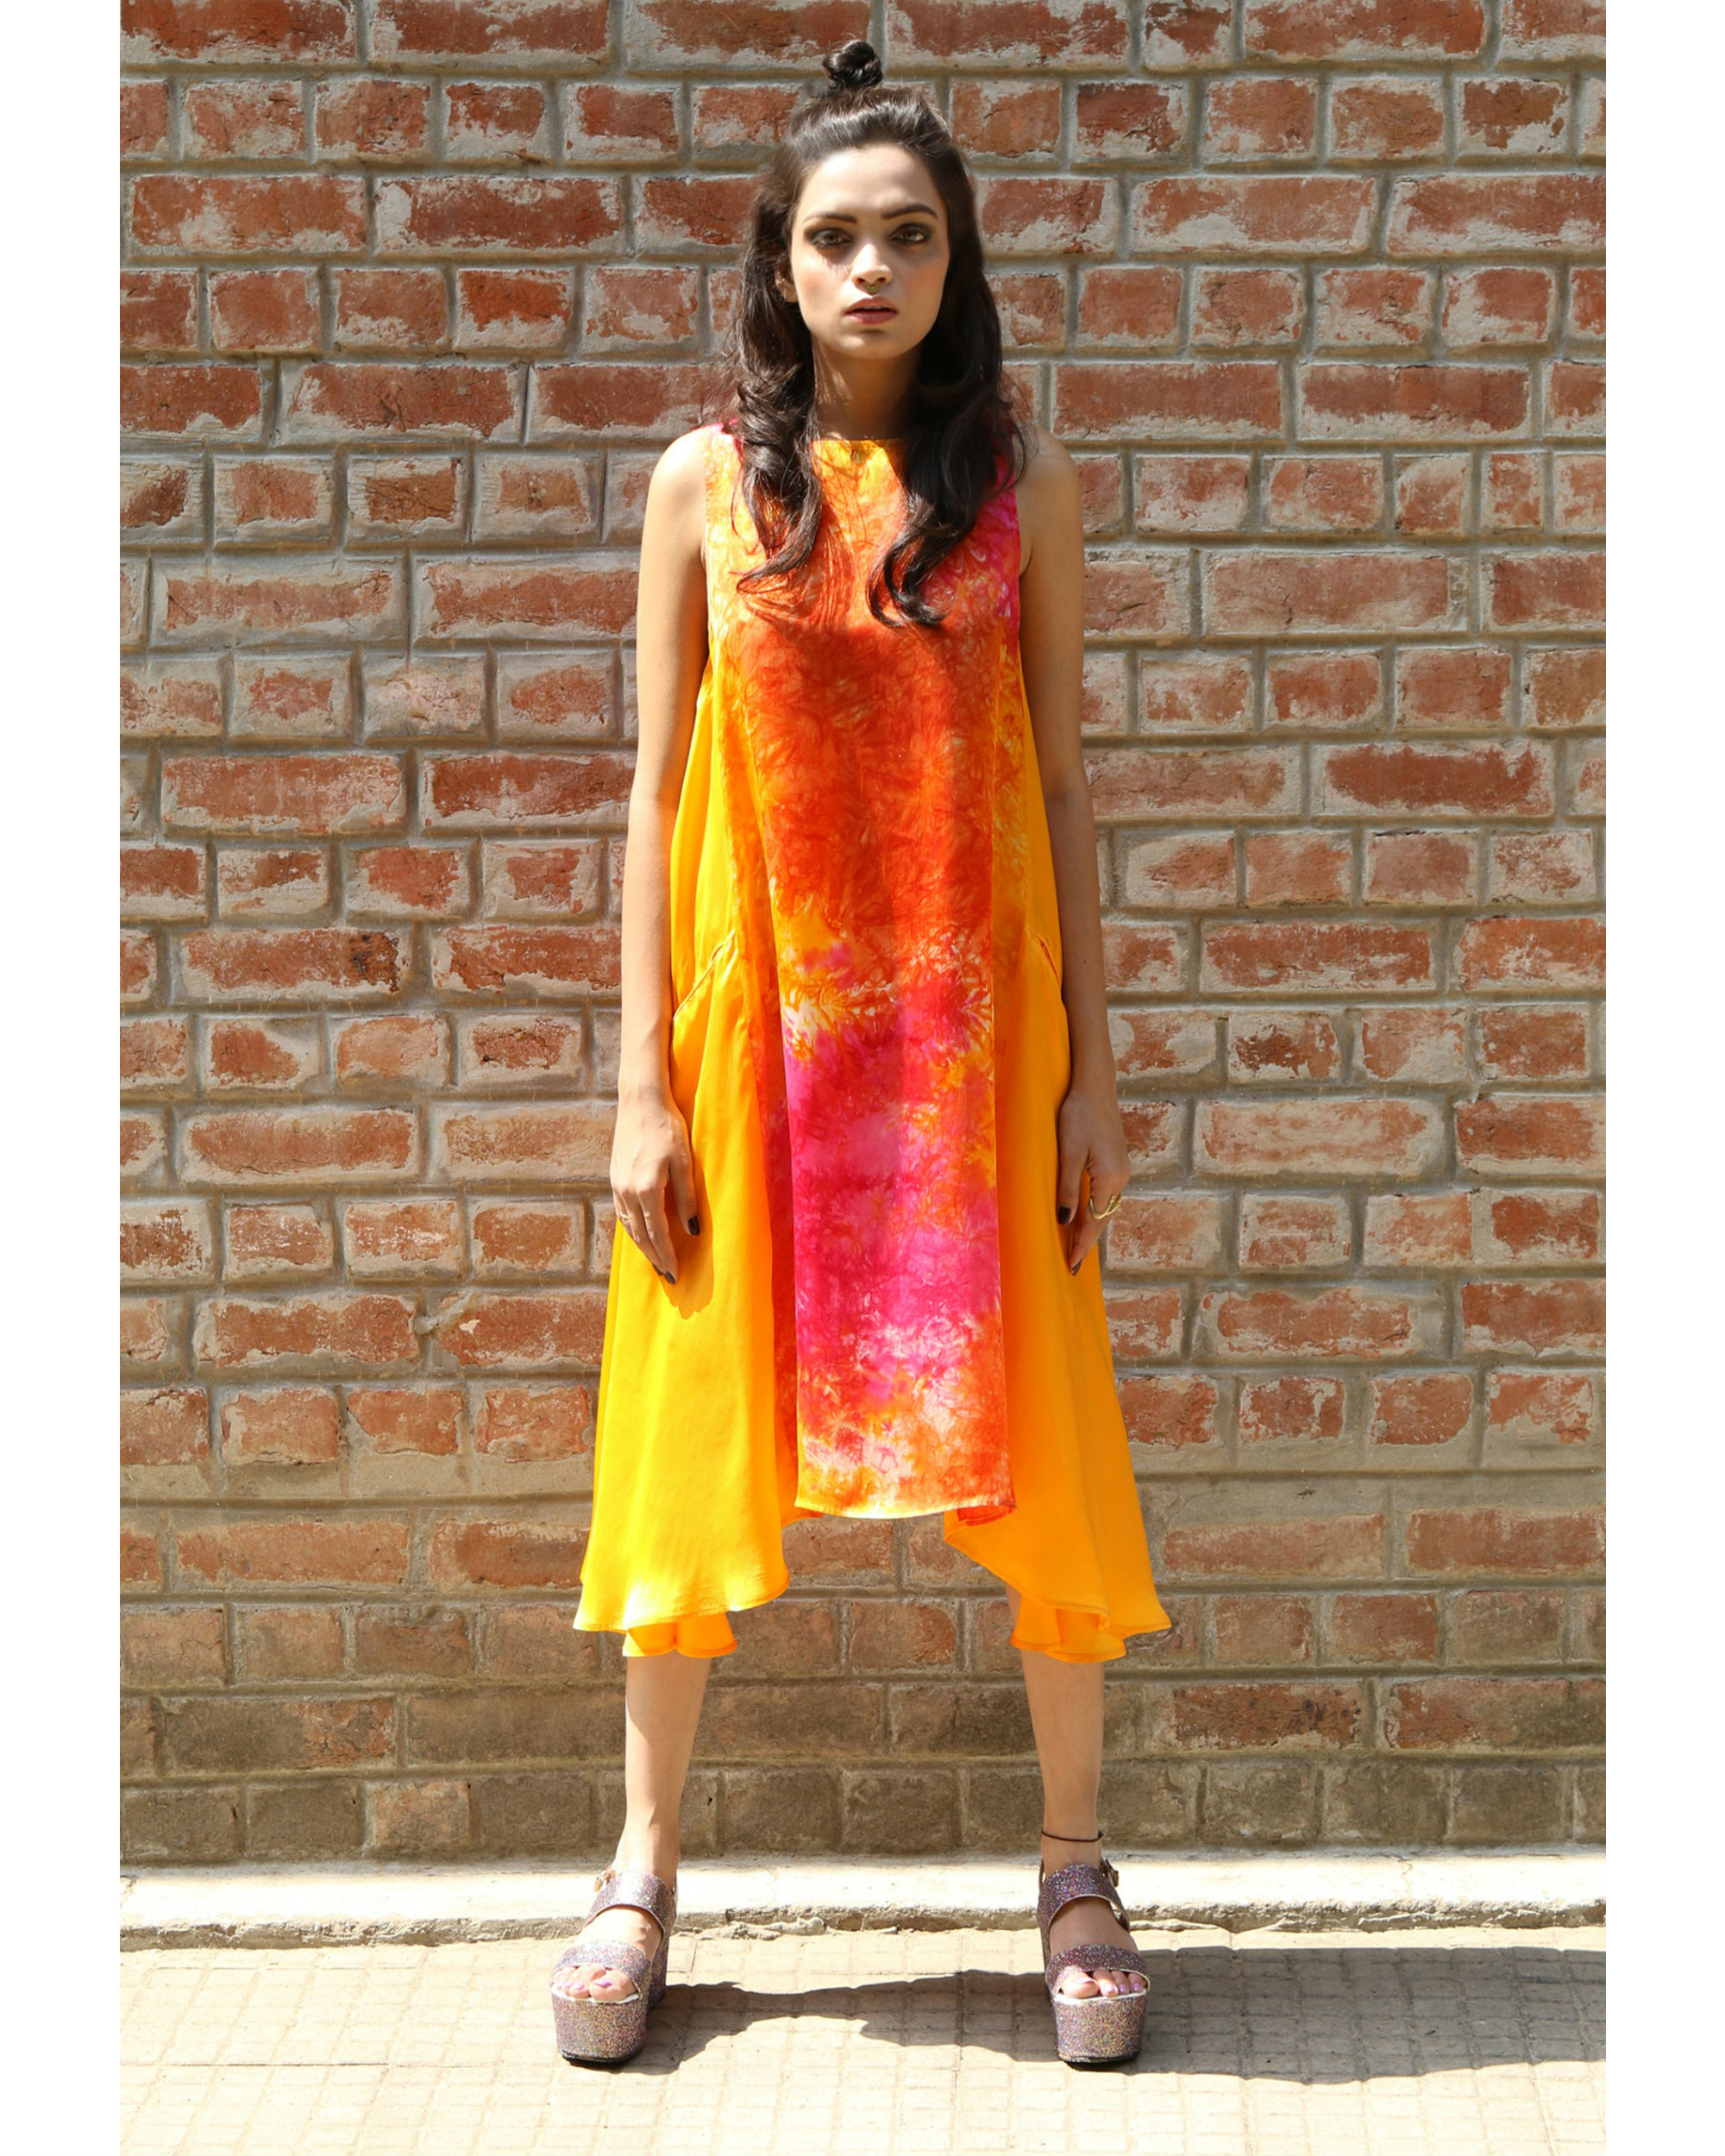 Trapese dress